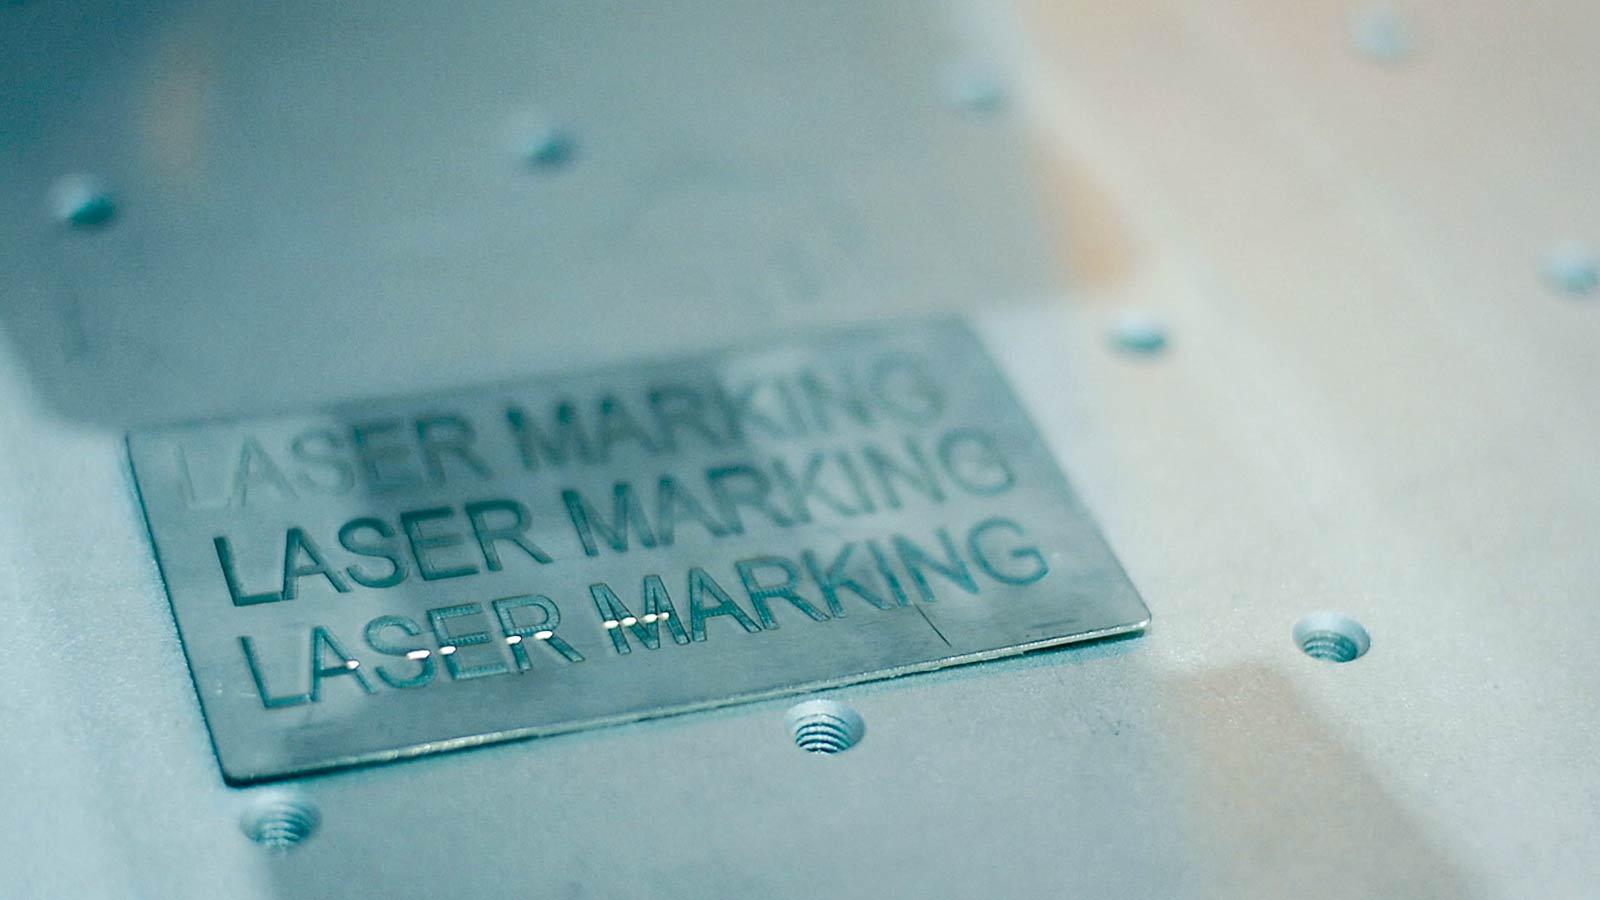 laser-marking-film